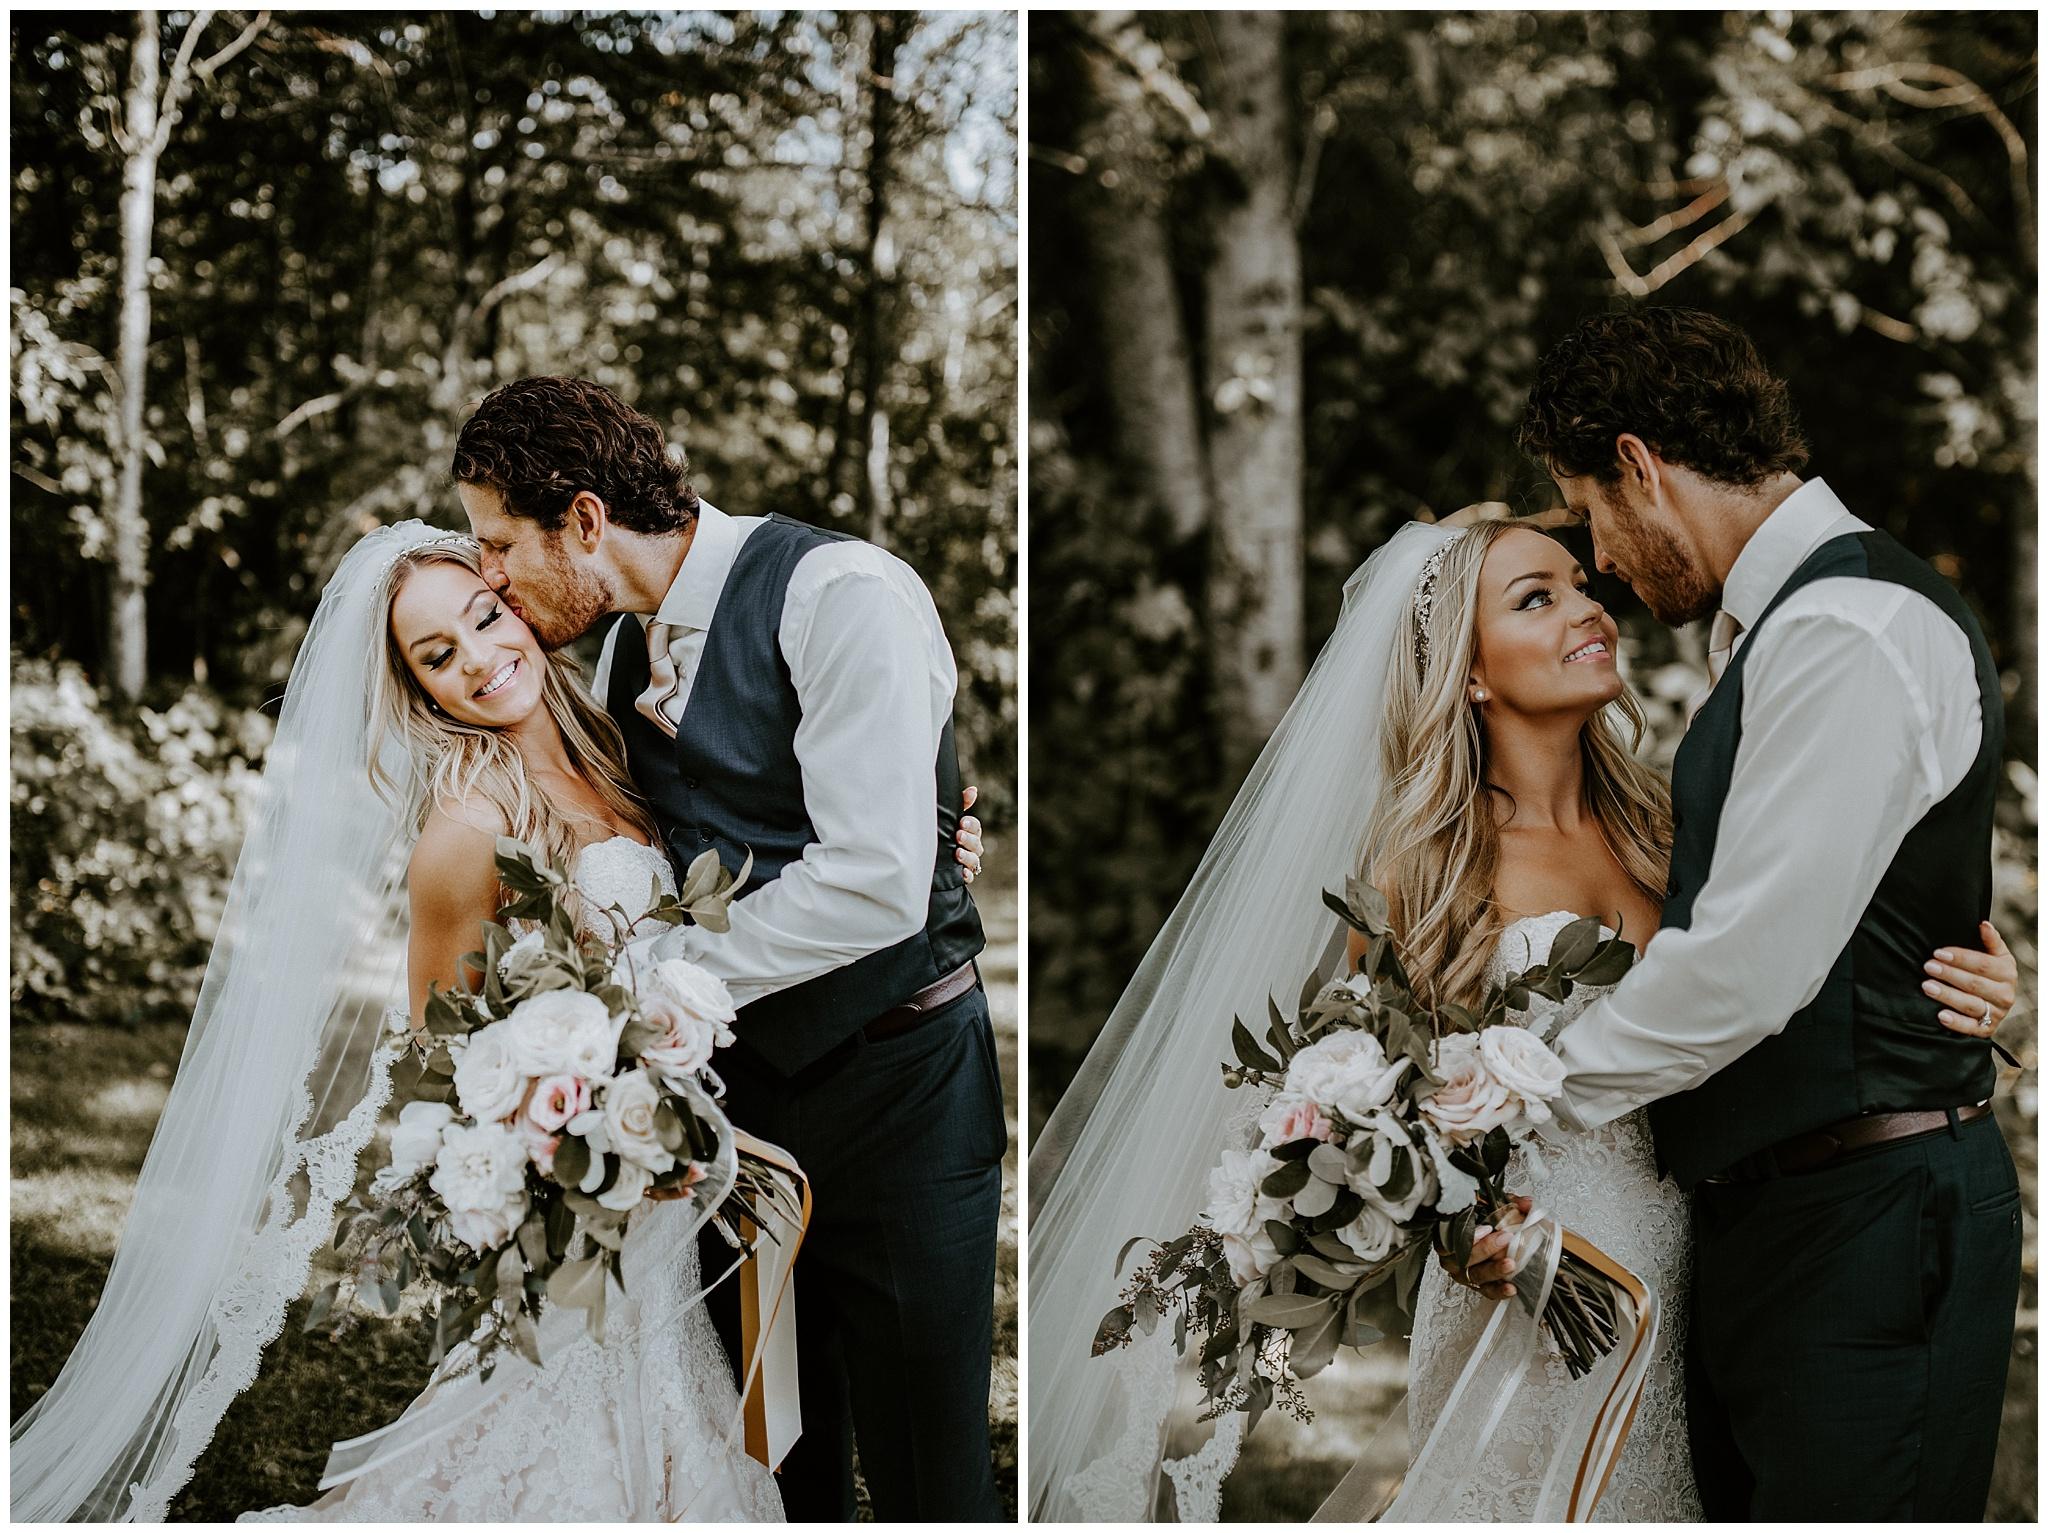 hart-house-vancouver-wedding-brittandkyle-012.JPG